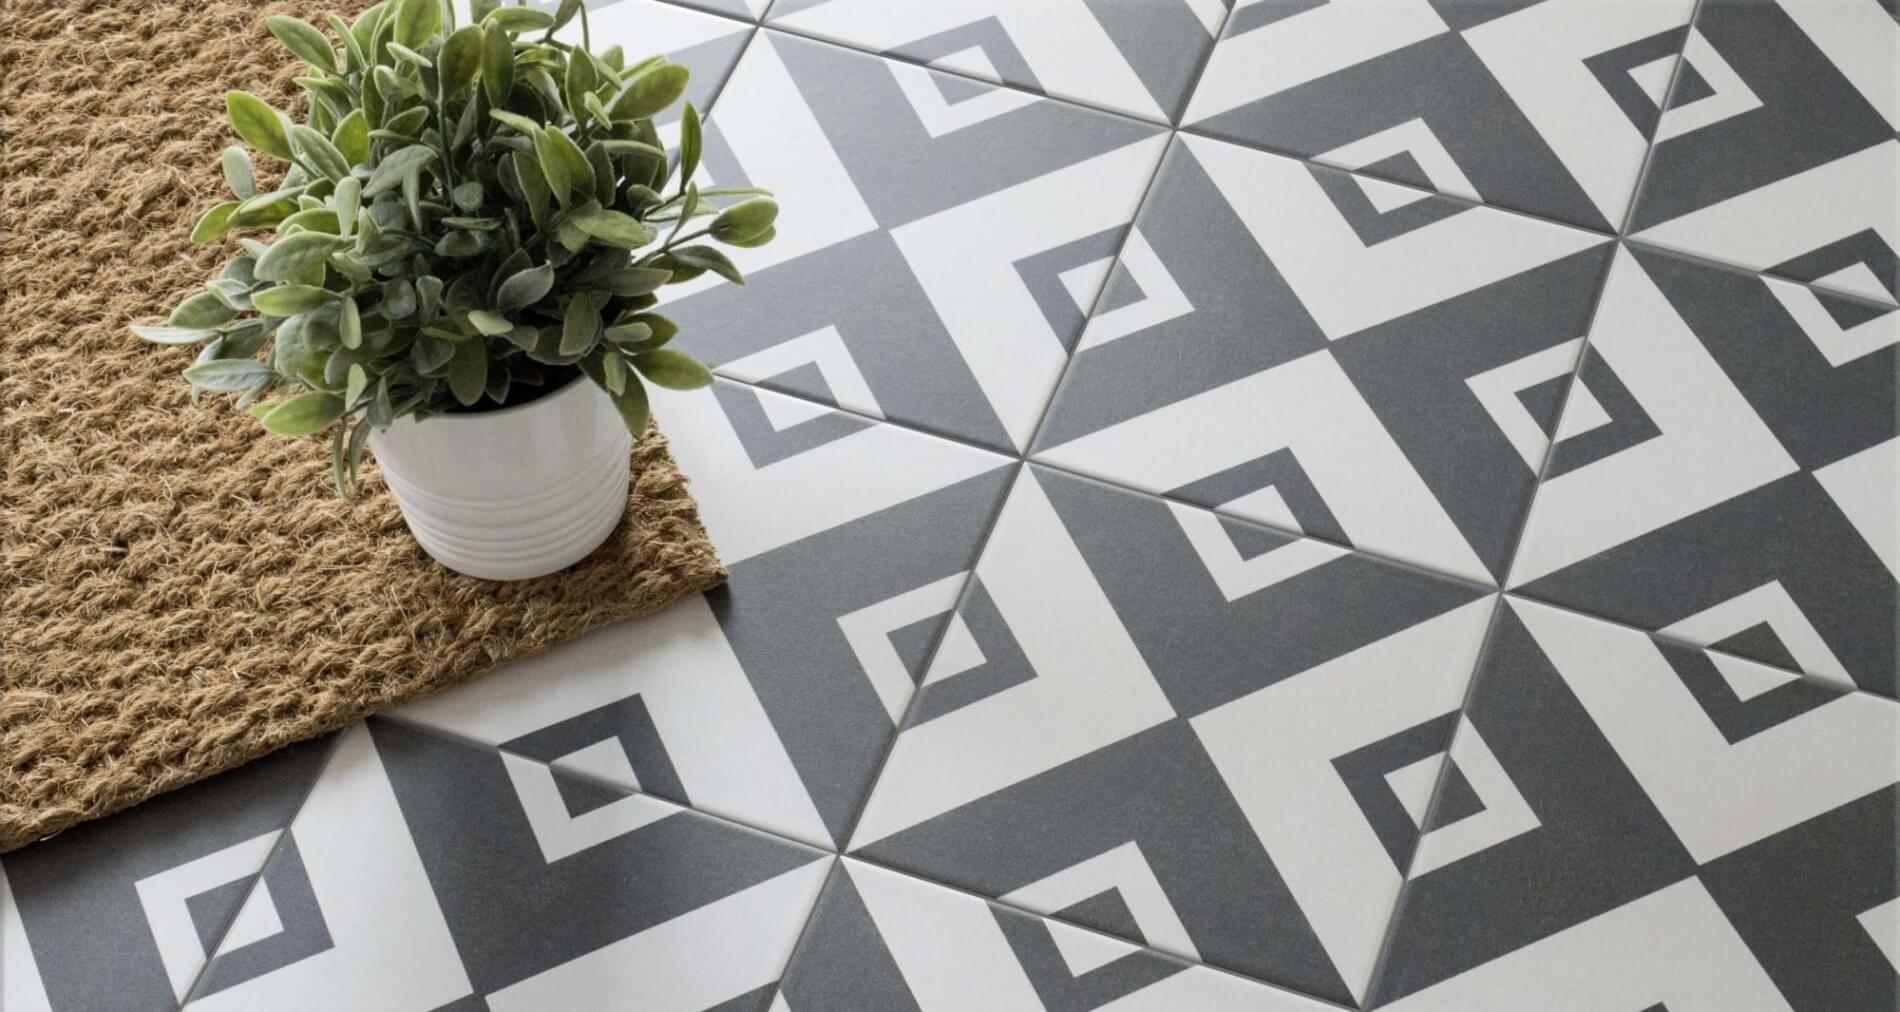 Conservatory Design Trends in 2020 - Alternating Tiles